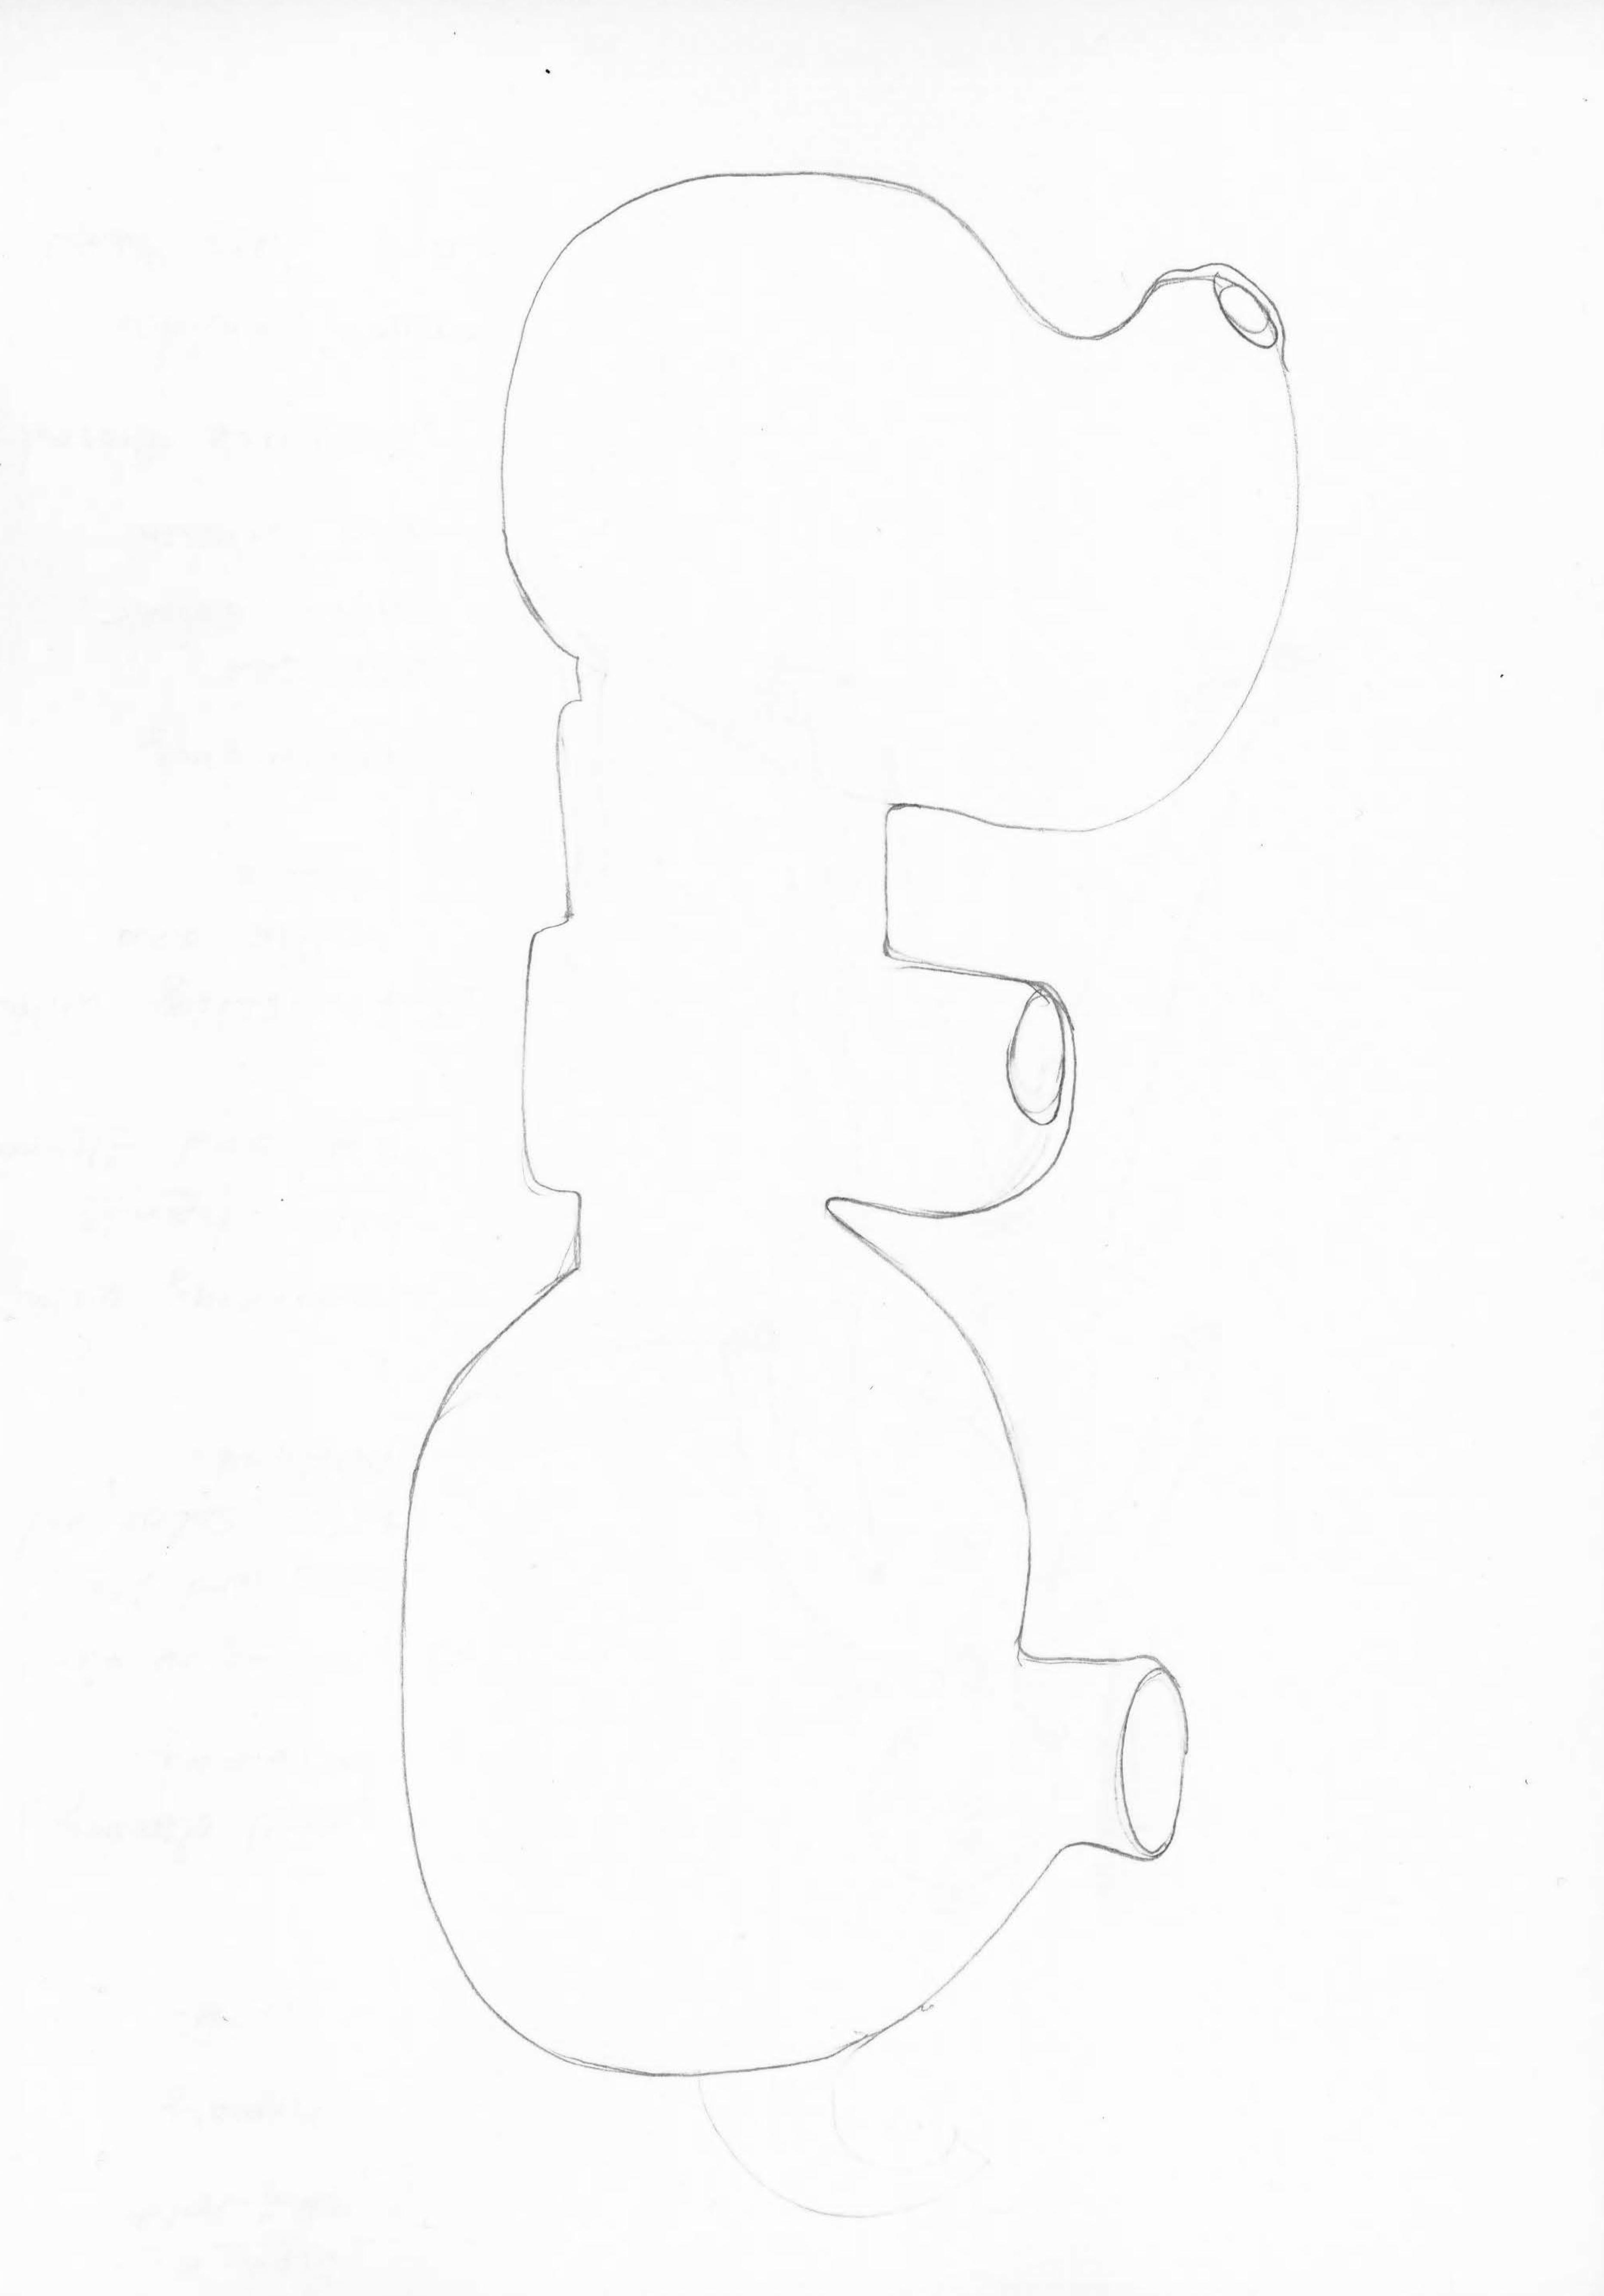 Georgia Sagri, Soma in orgasm as heart, 2017, pencil on paper, 29.5 × 20 cm